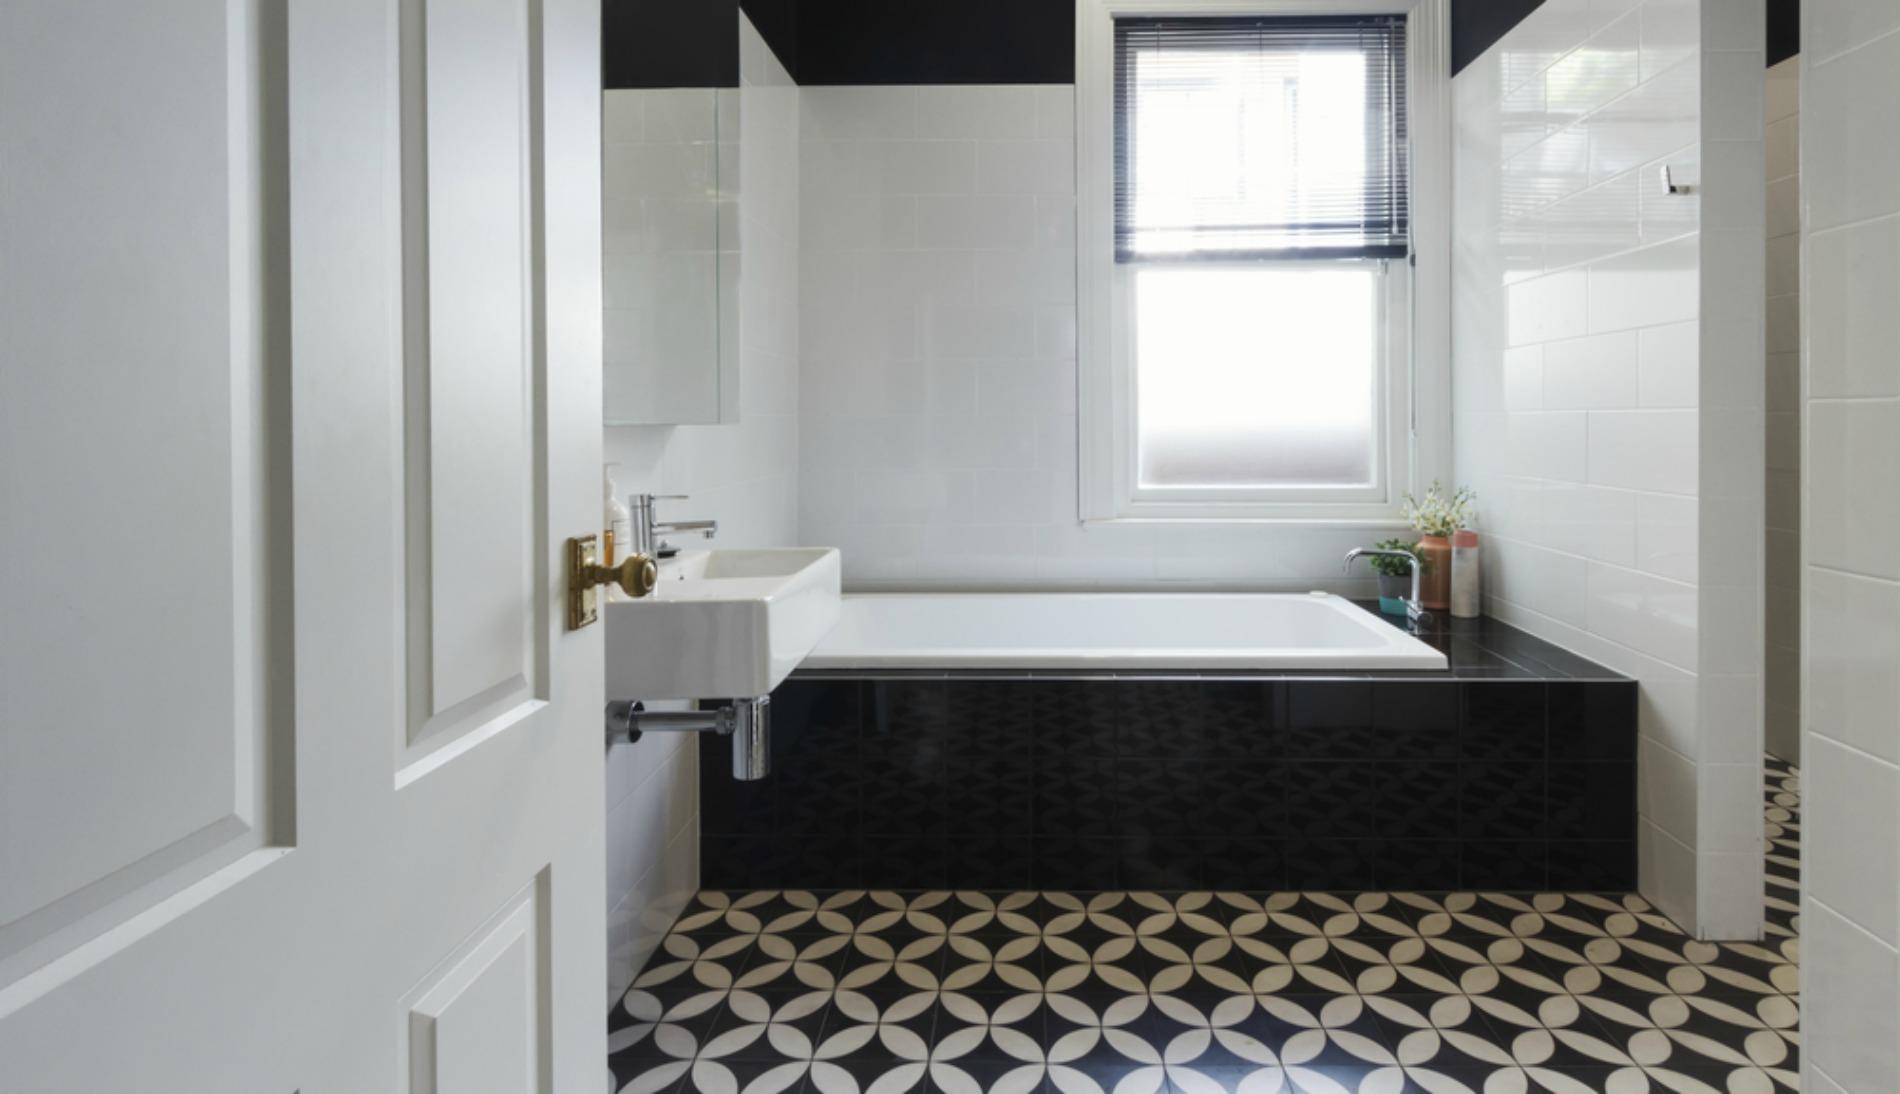 black-and-white-patterned-floor-tiles-header